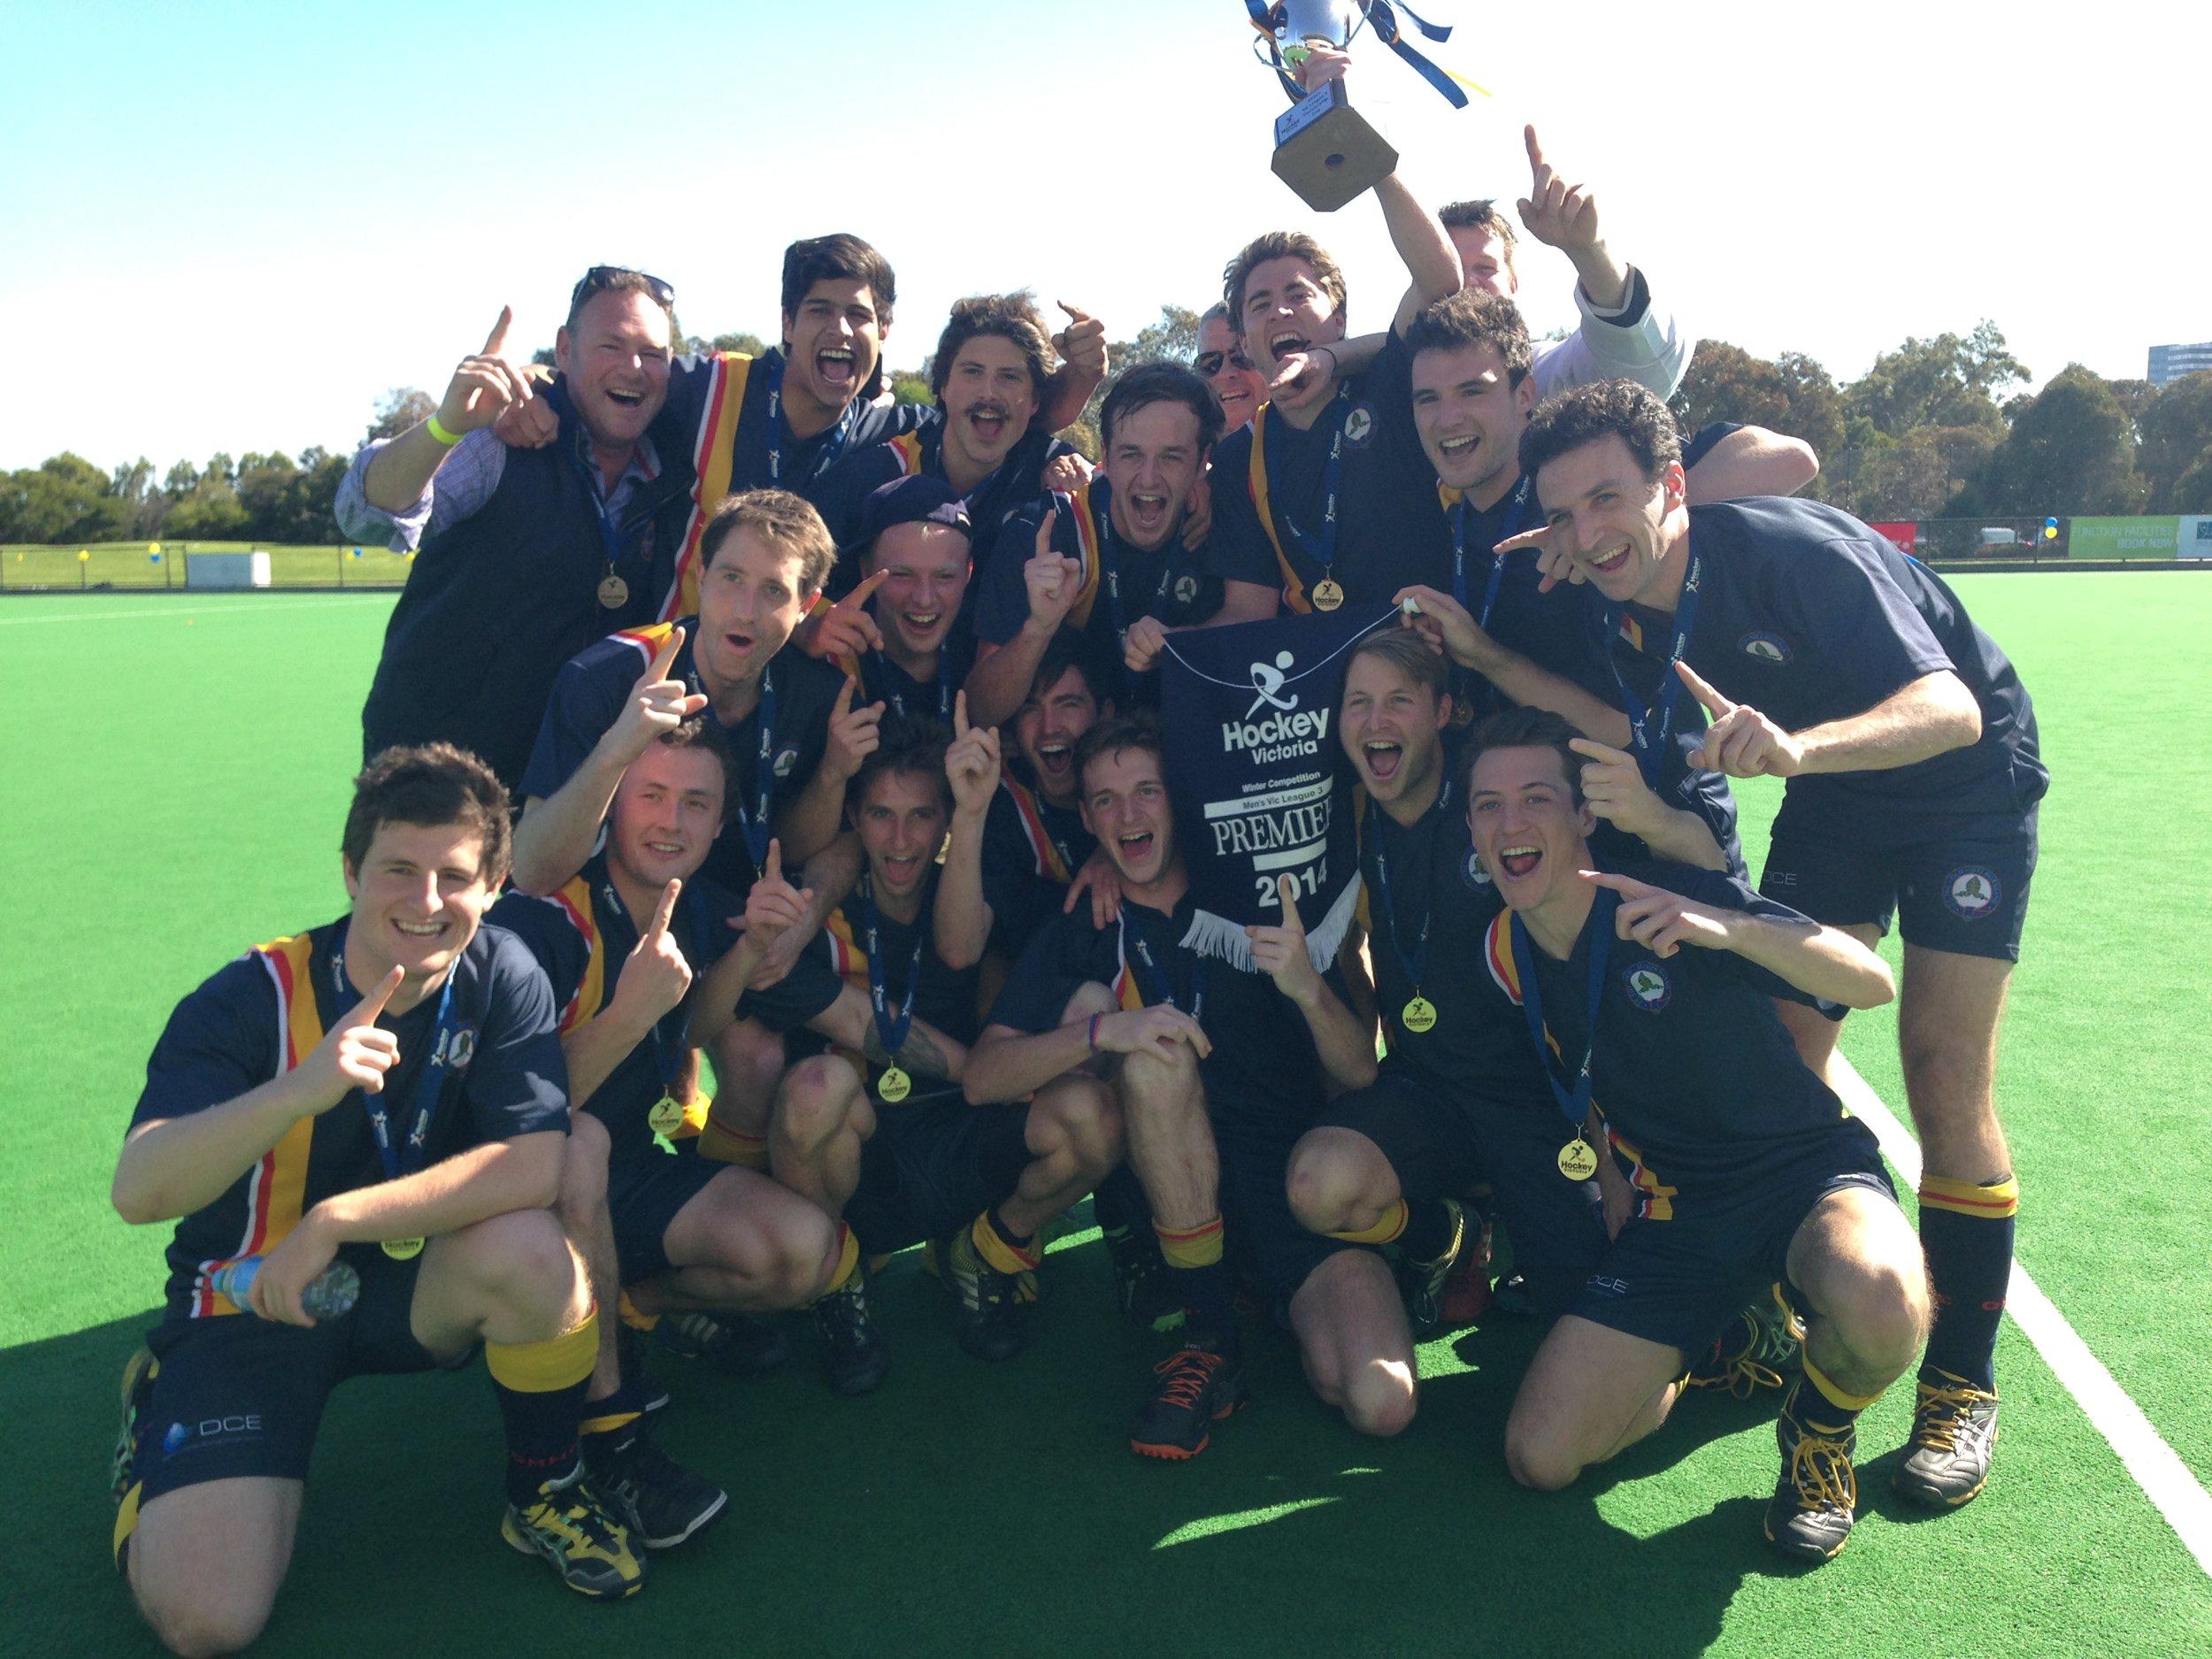 2014 - VL3 Champions